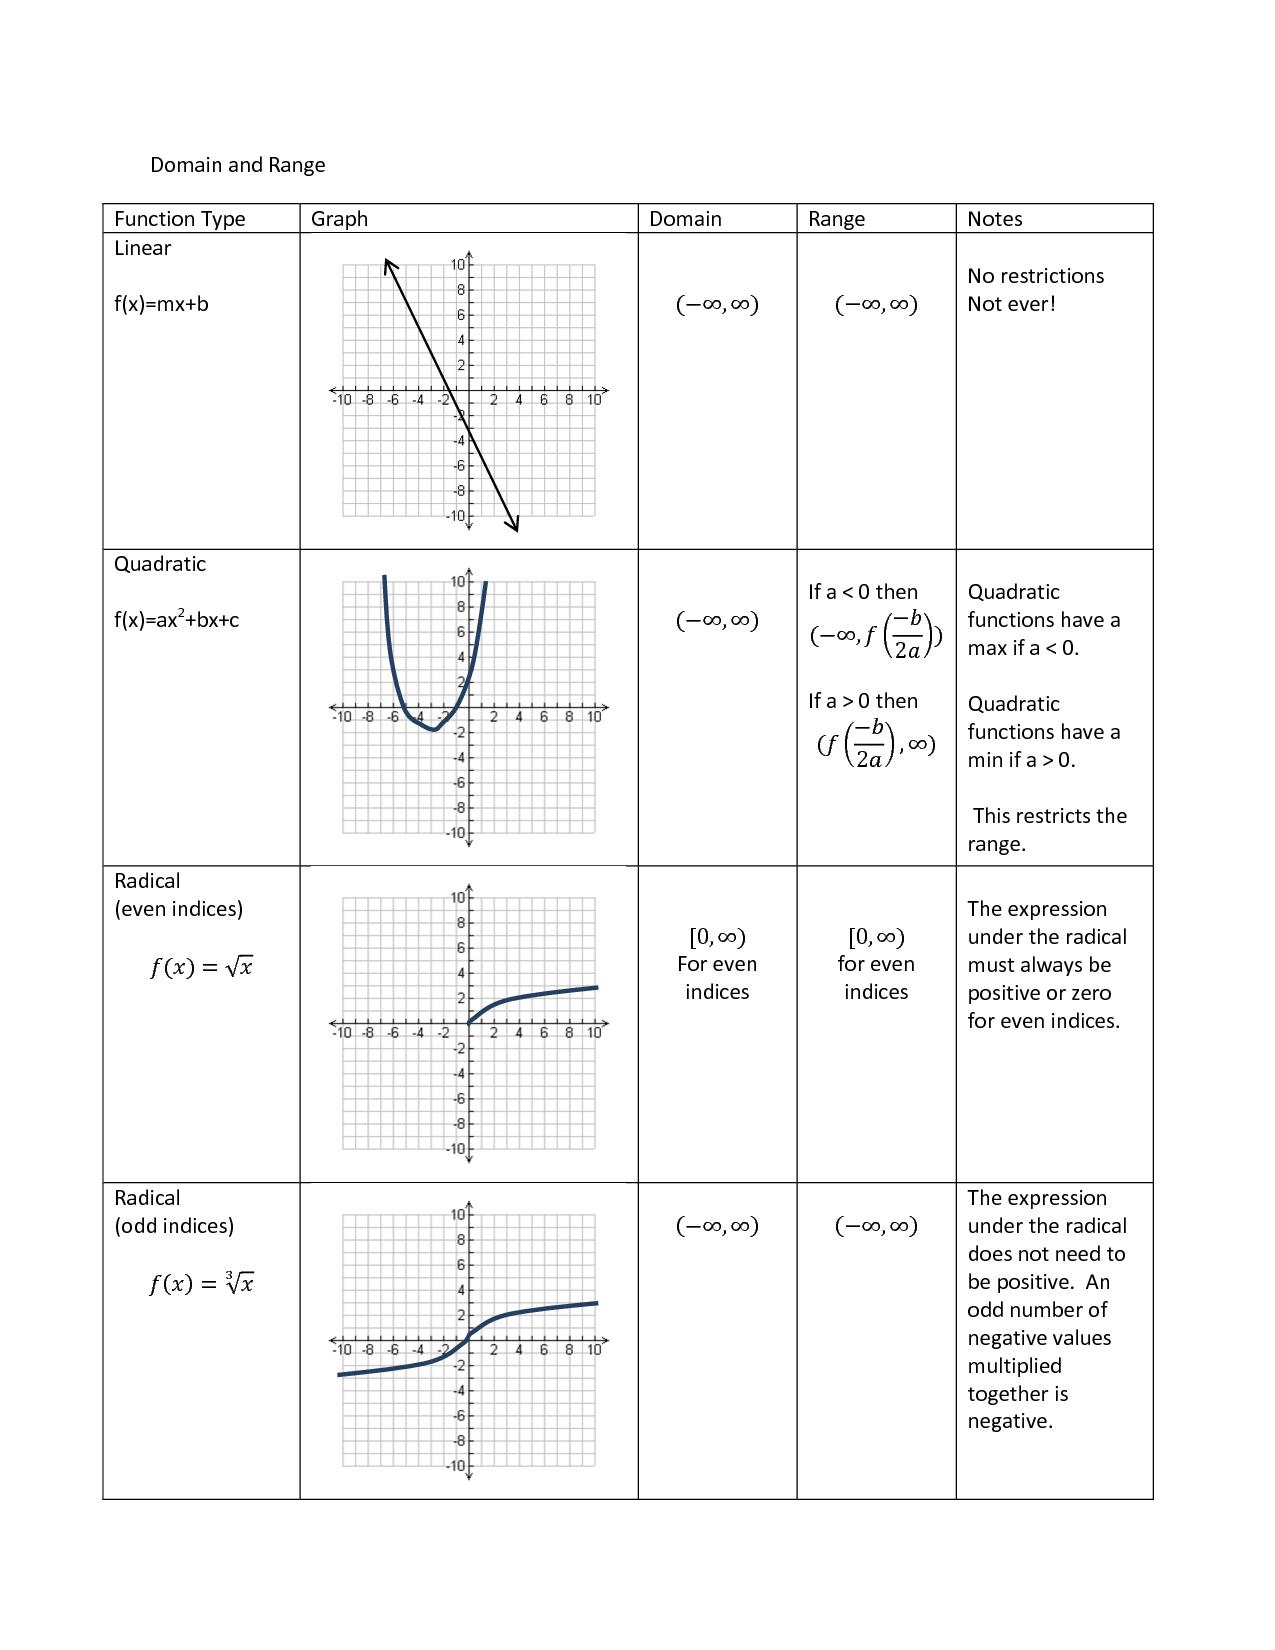 Worksheet Domain And Range Worksheets And Range Worksheets Algebra With Domain And Range Of Graphs Worksheet Answers